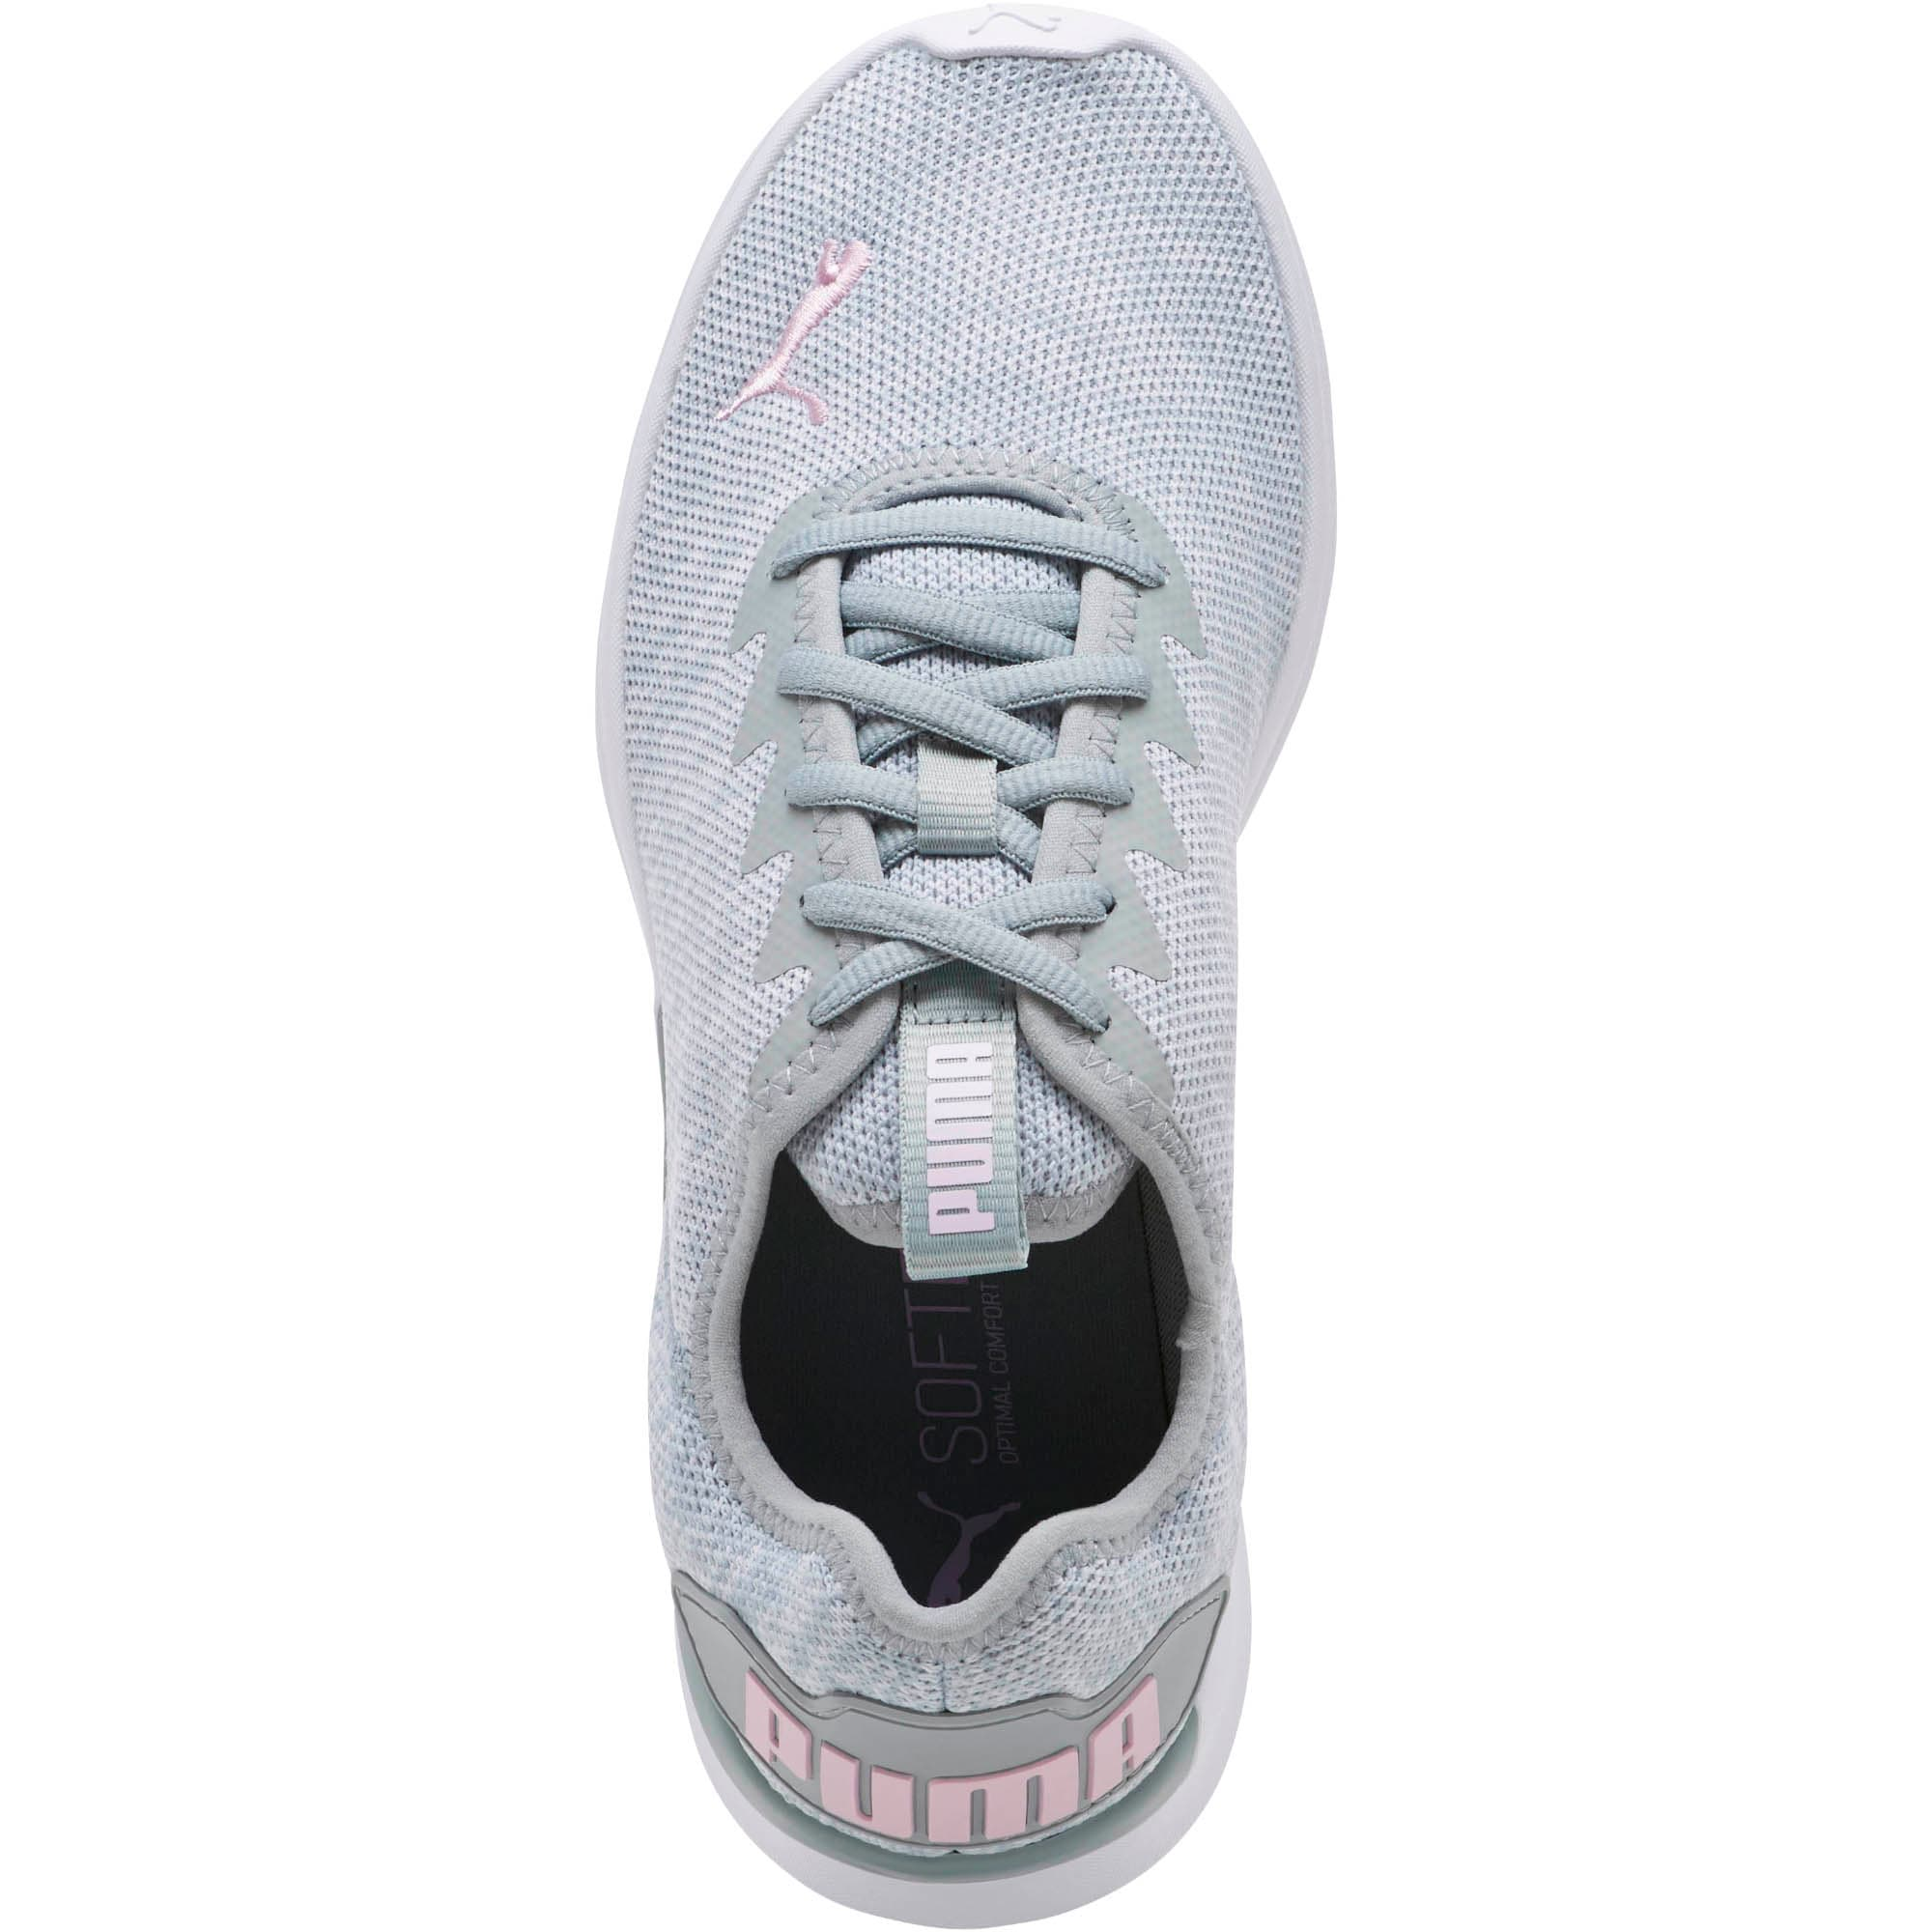 Thumbnail 5 of Ballast Women's Running Shoes, Quarry- Orchid- White, medium